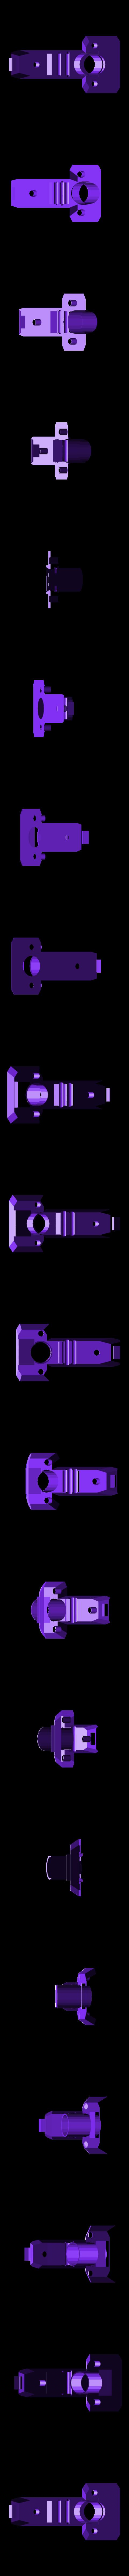 mp7  2 aep front end encaixe.stl Download STL file mp7 front end • Model to 3D print, gungriffonbr